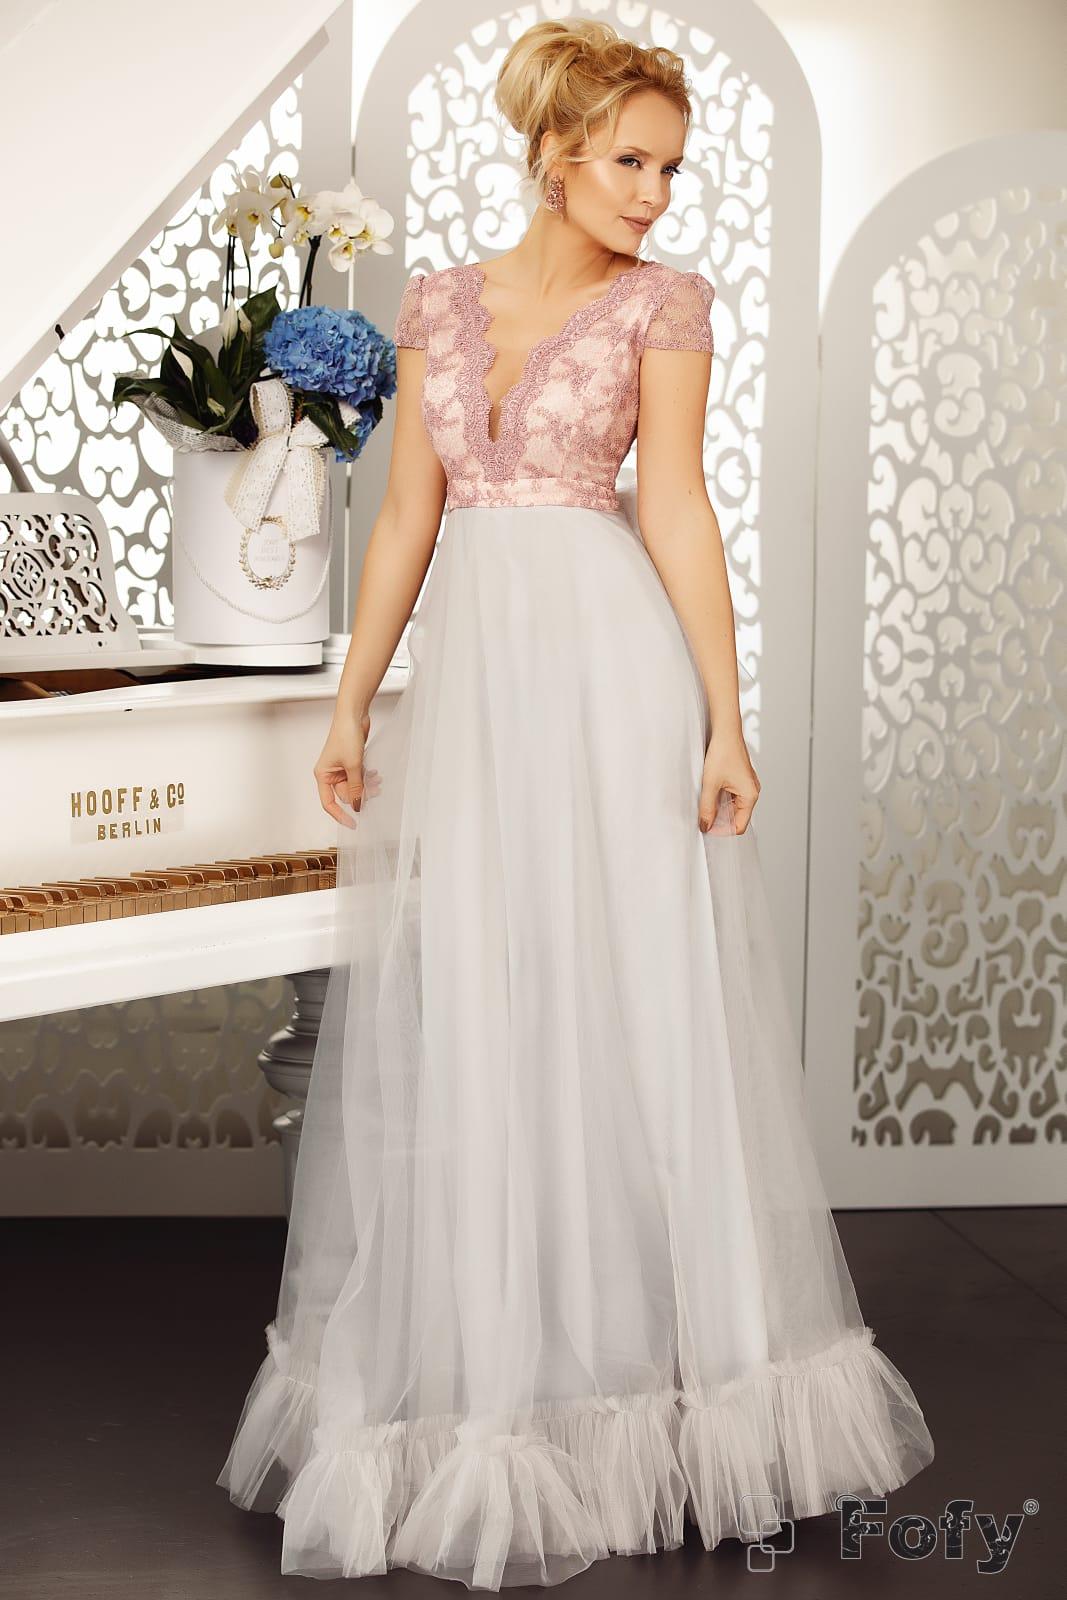 Rochie Trendiness Bicolora